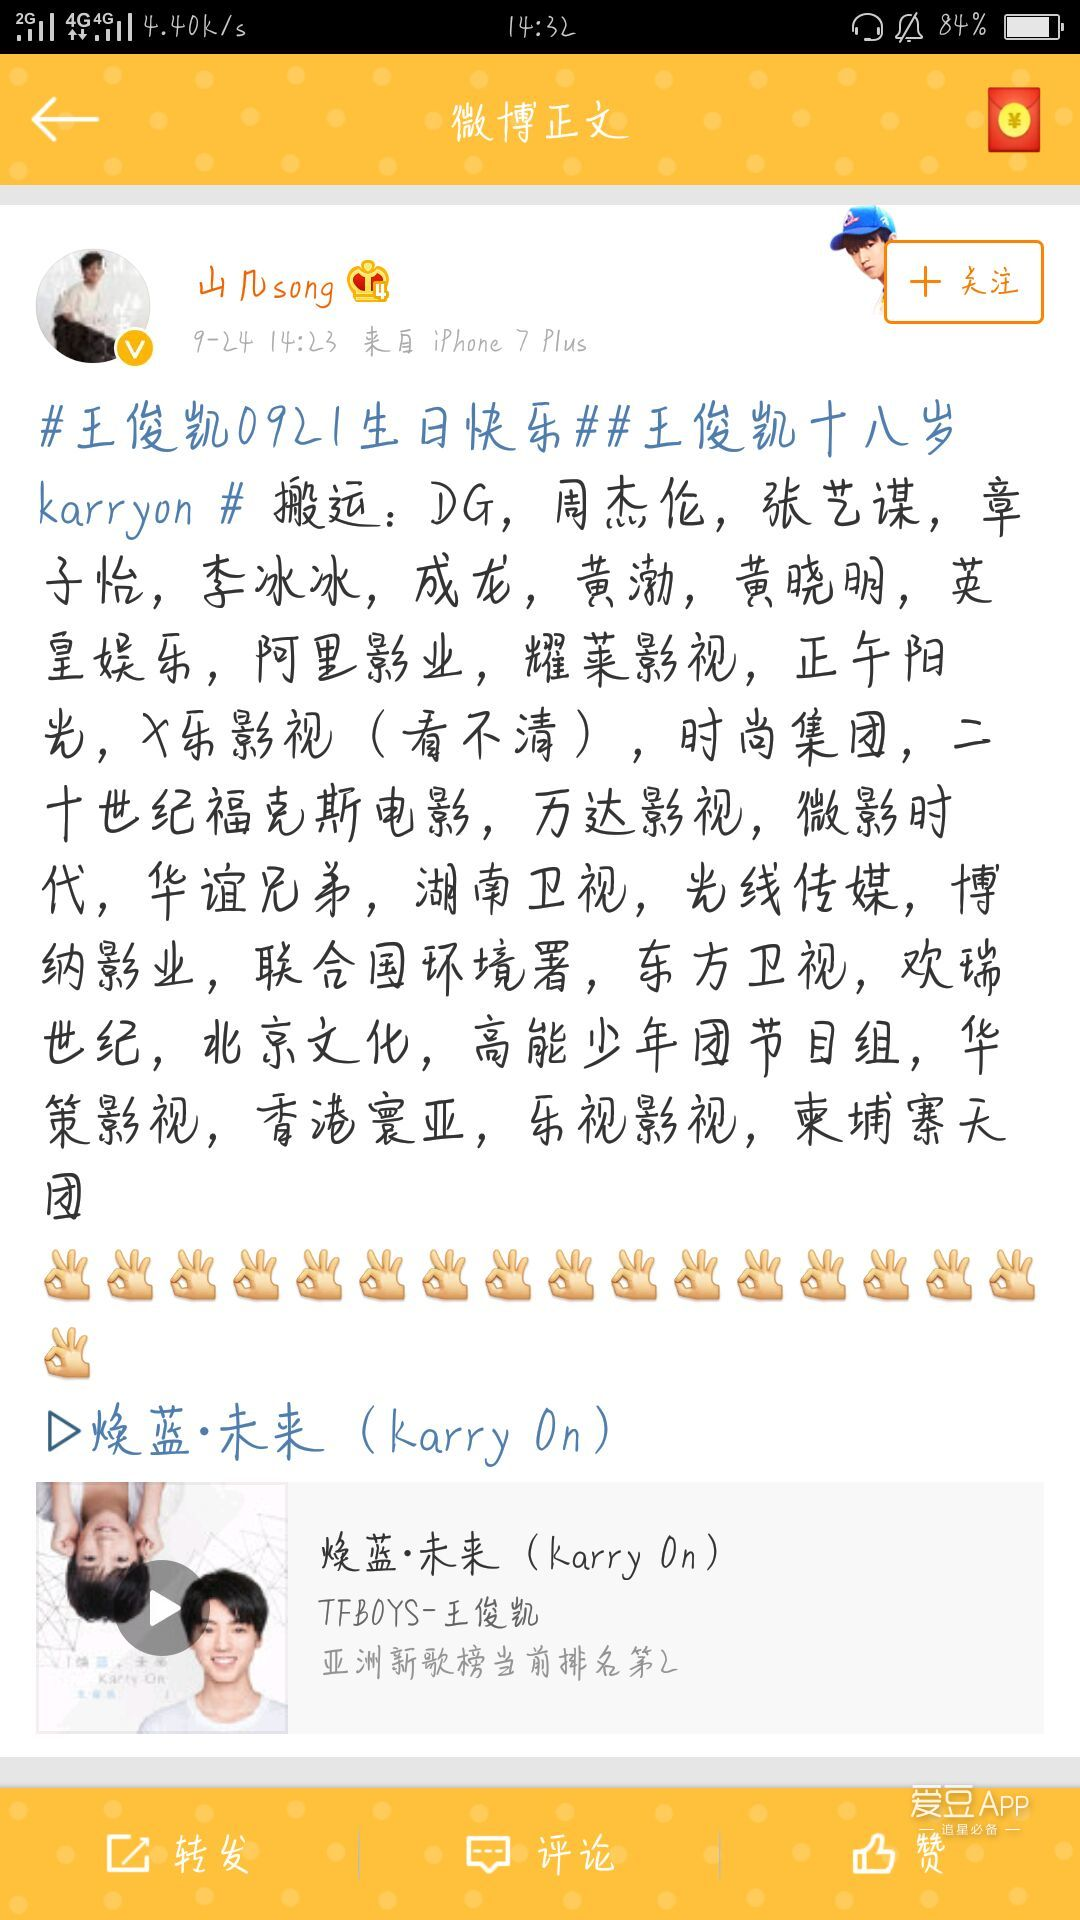 [TFBOYS][新闻]170924 王俊凯成人礼生日会  前辈纷纷送花篮表示祝贺